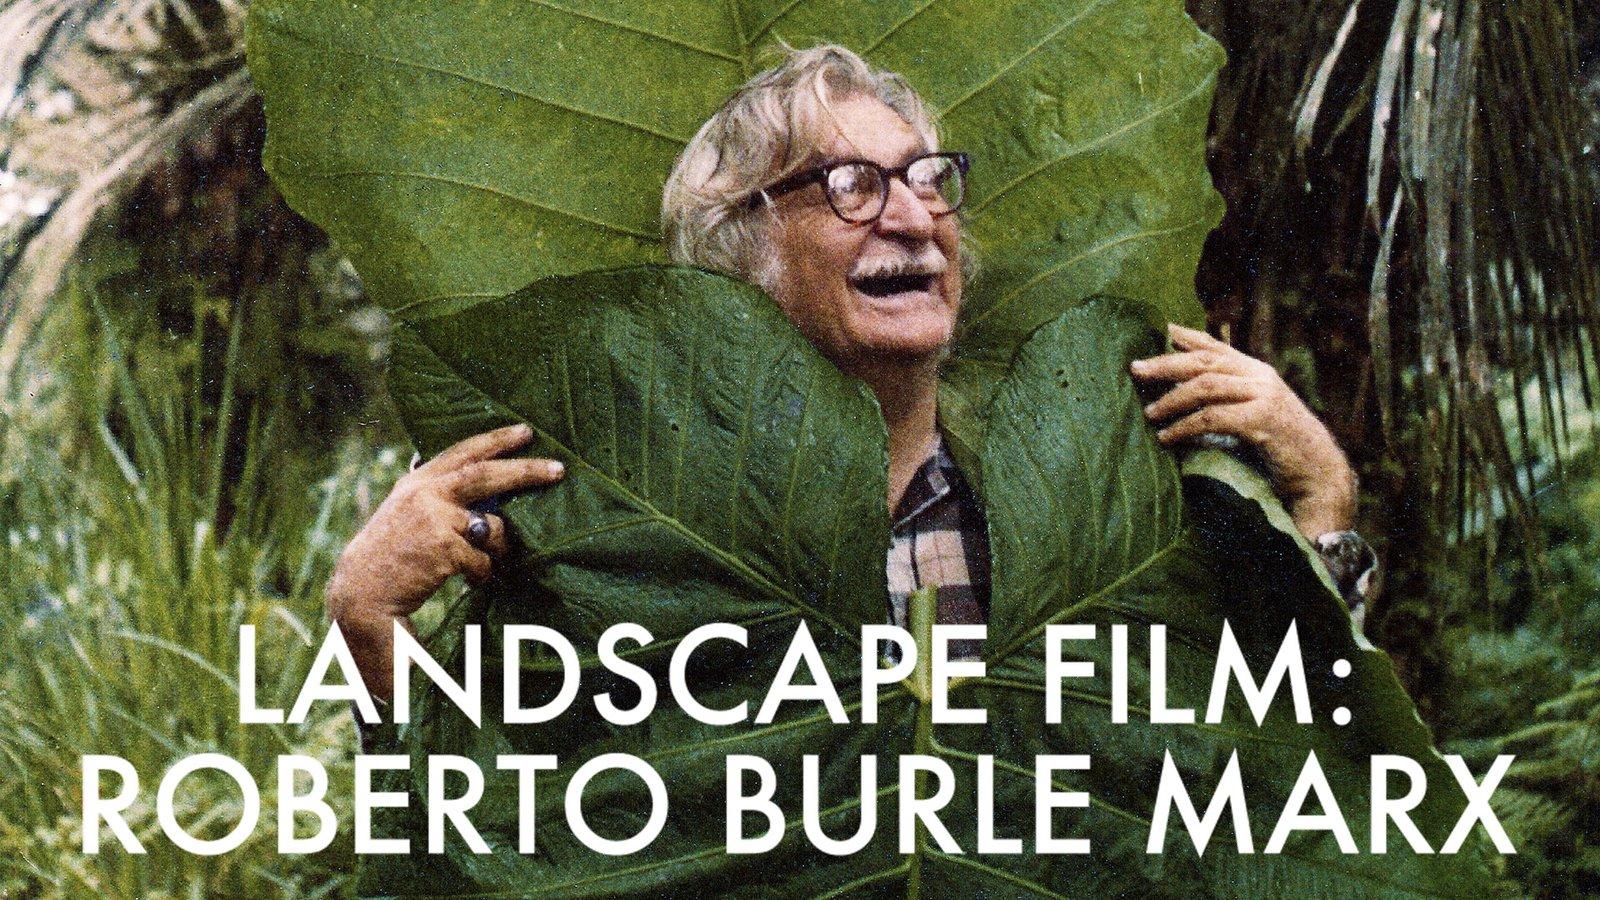 Landscape Film - Brazilian Landscape Architect and Painter Roberto Burle Marx